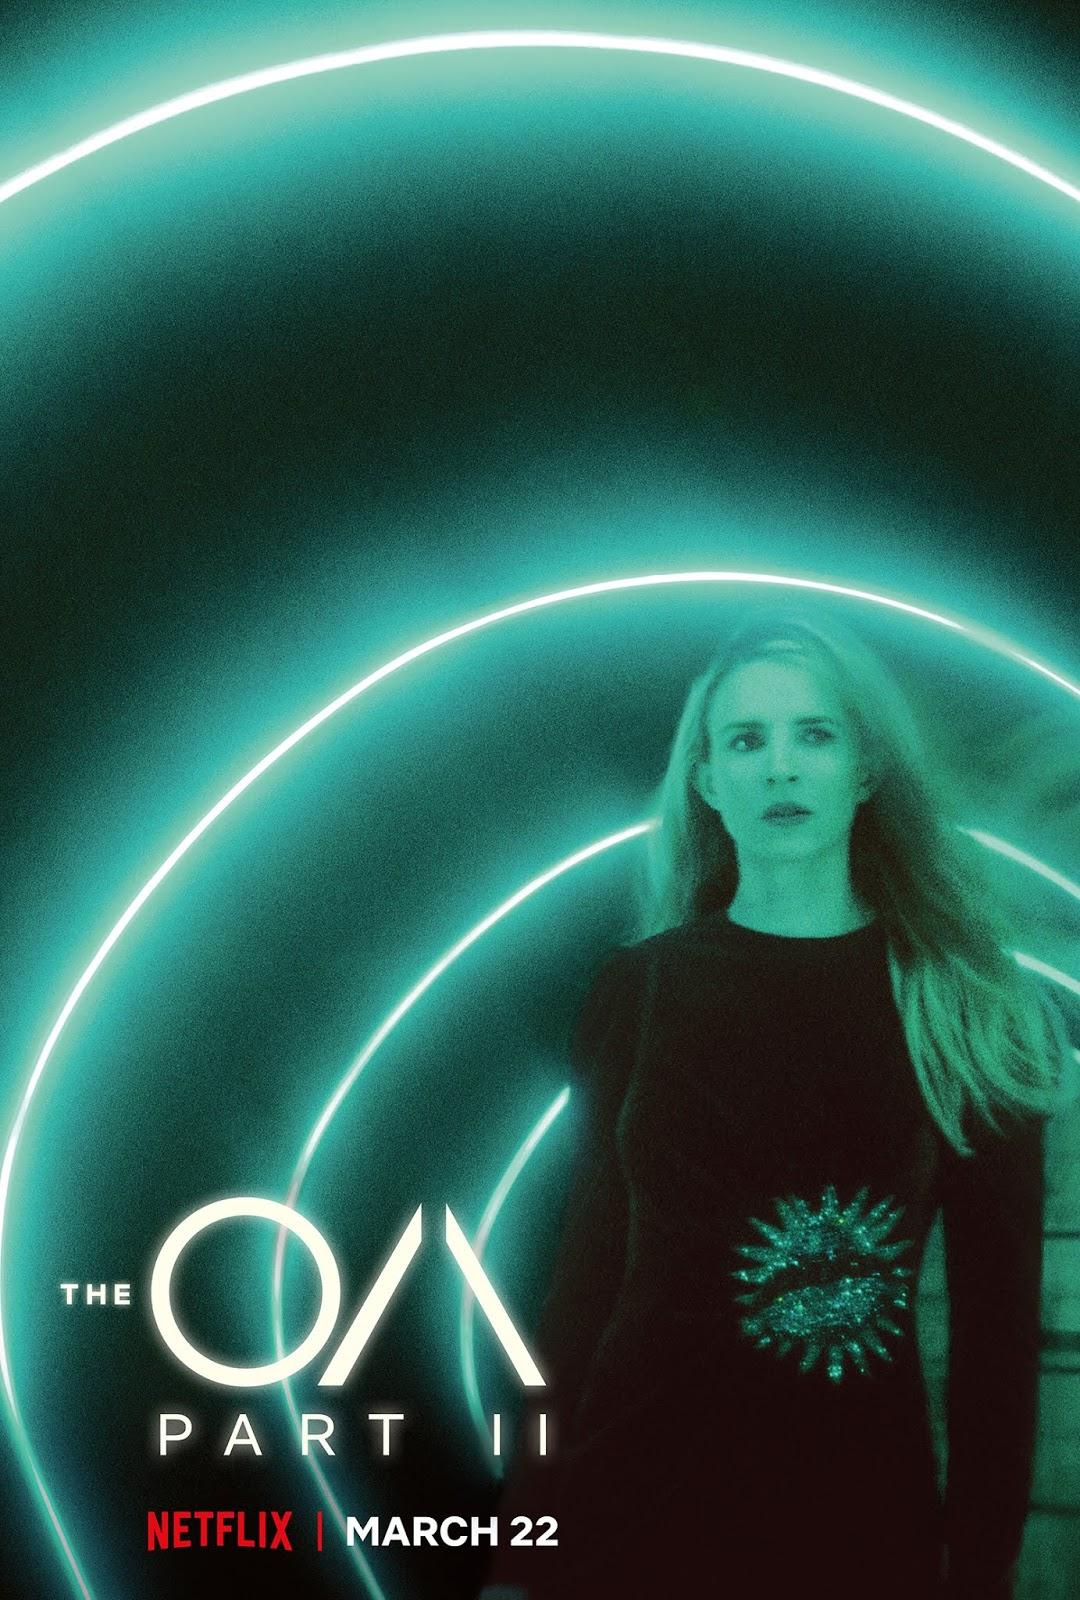 The TV MegaSite's Primetime News Chat: The OA Part II